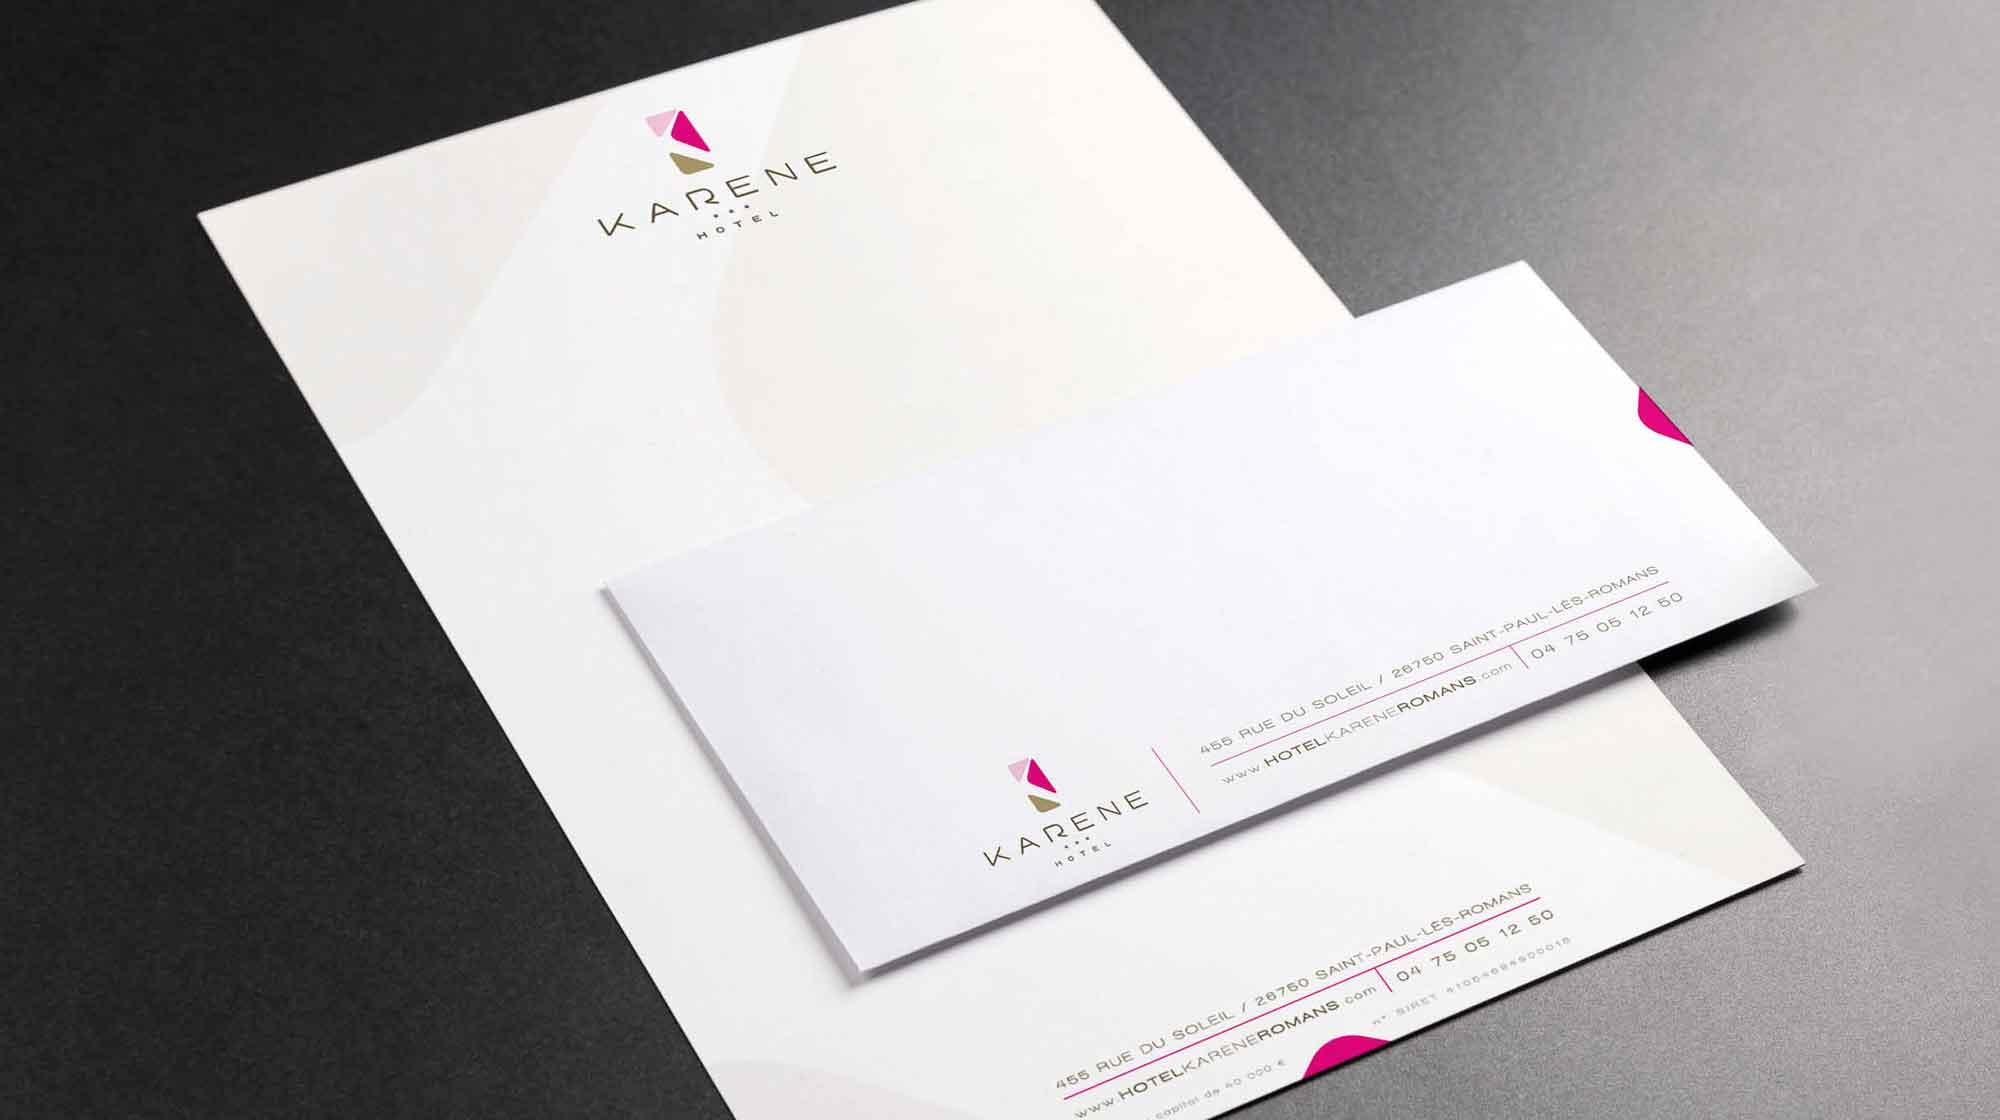 reference-hotel-karene-6